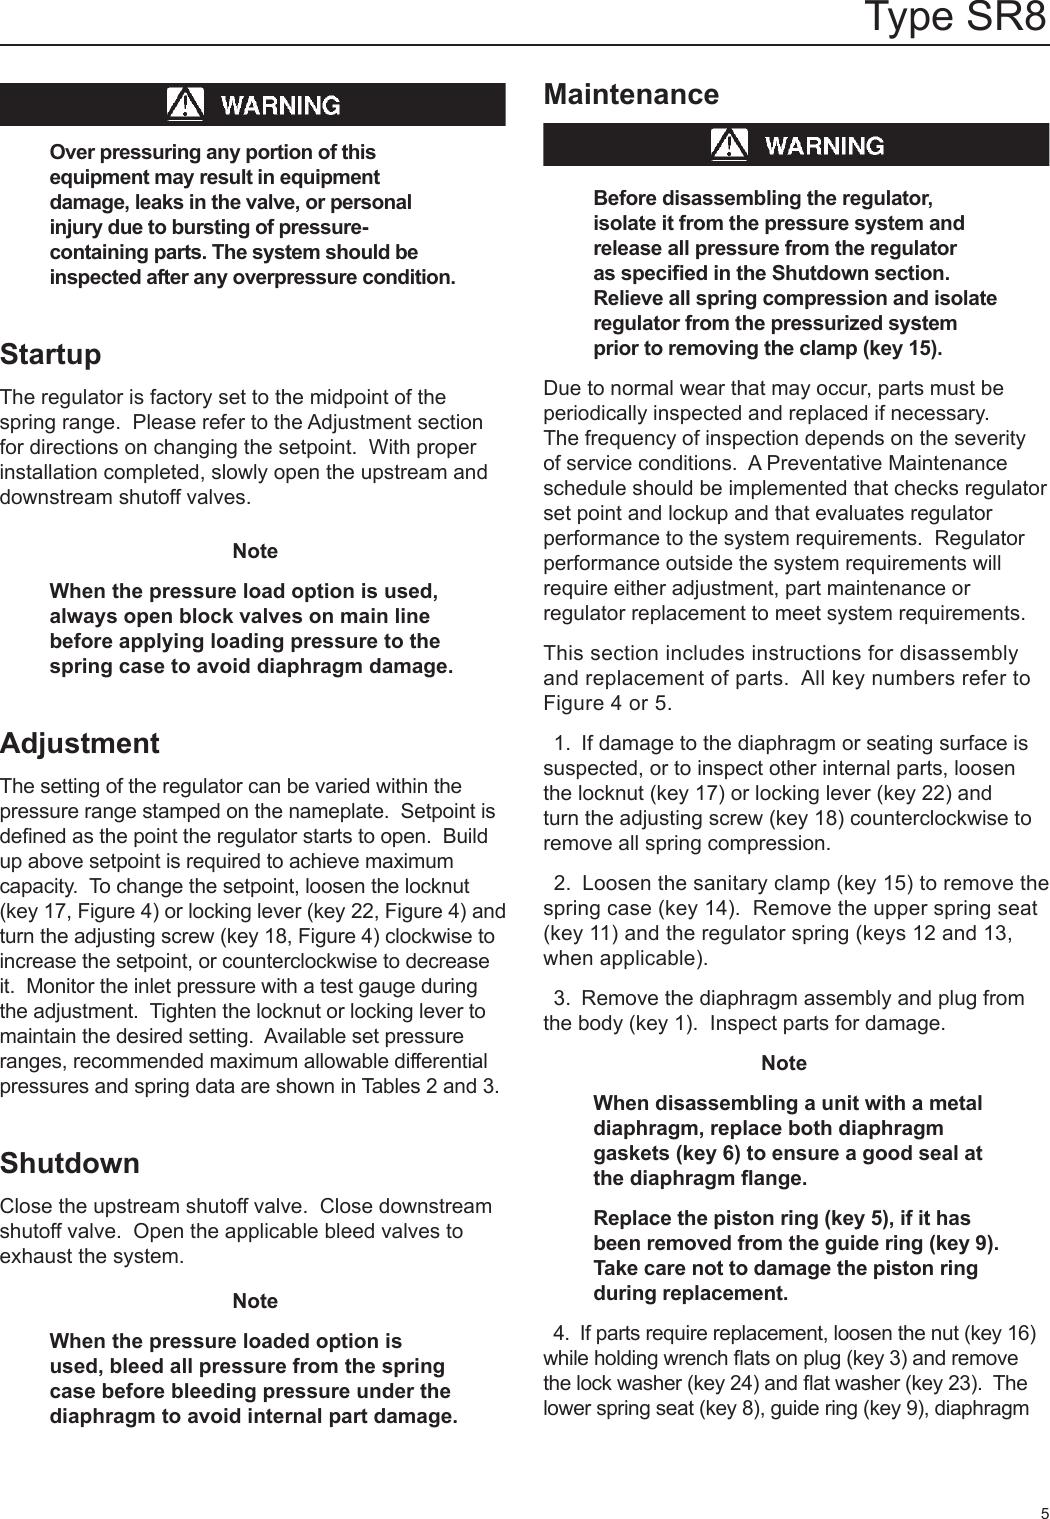 Emerson Type Sr8 Sanitary Backpressure Regulator Instruction Manual